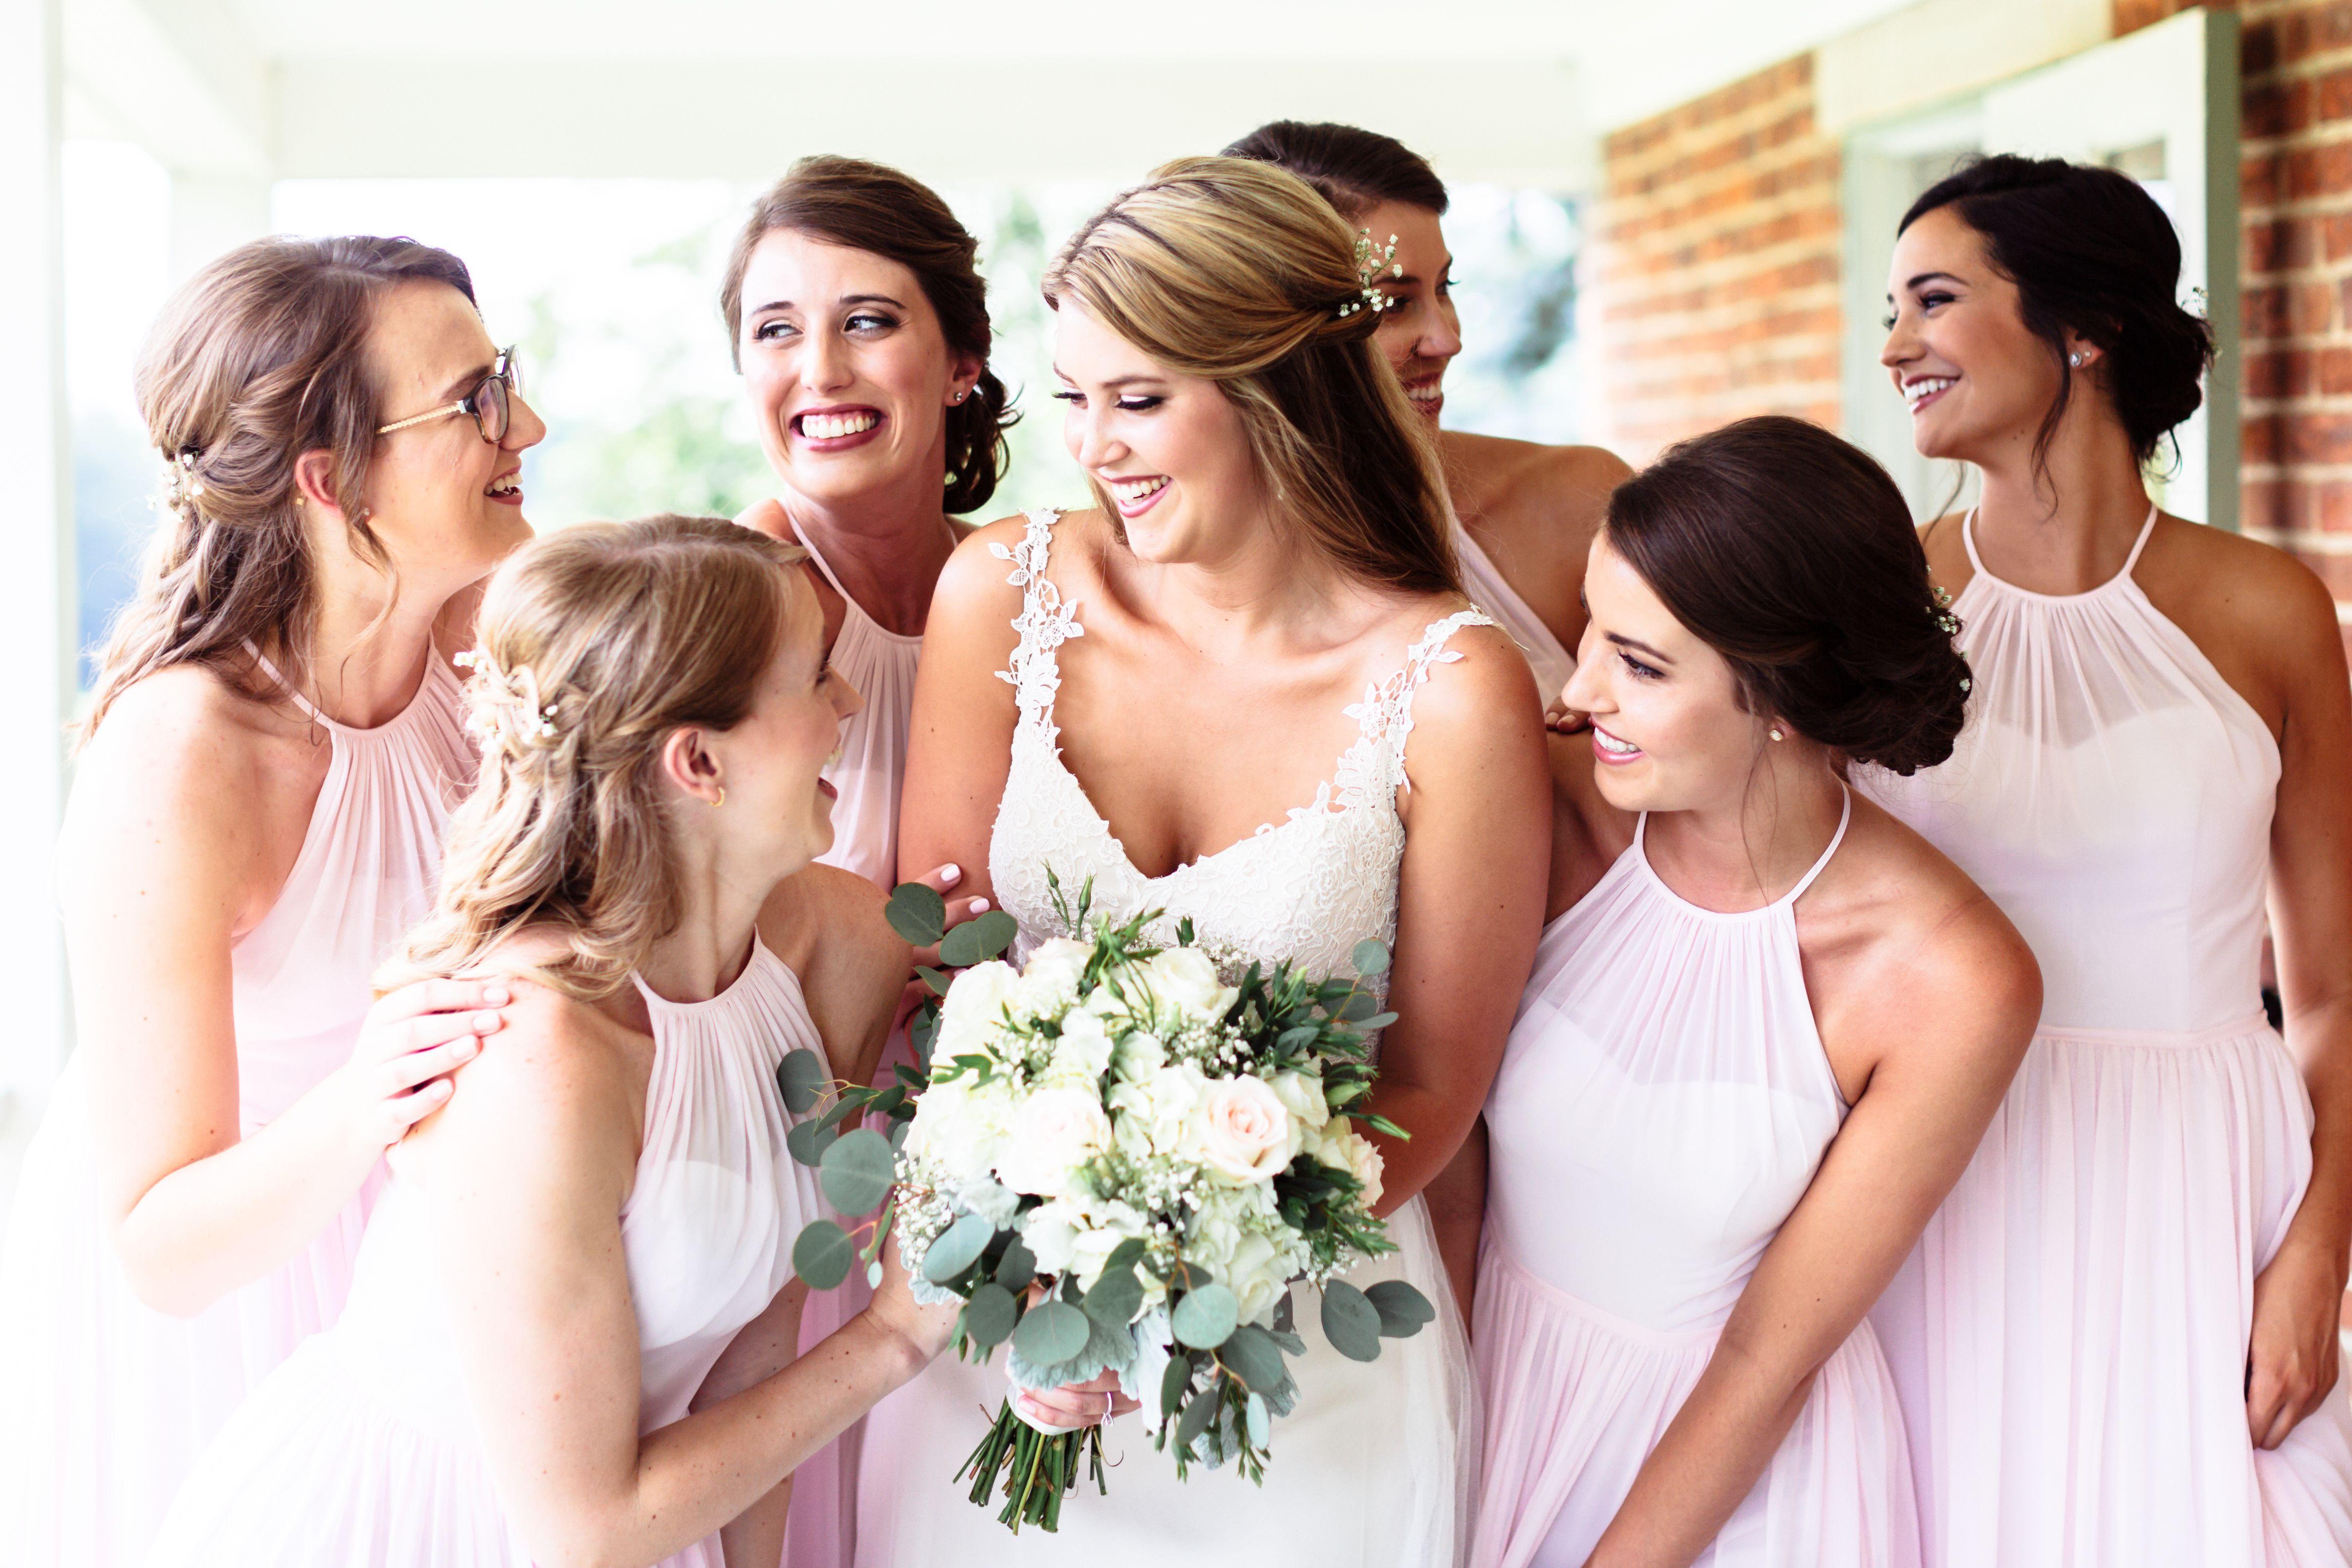 Pin on Weddings + Elopements | Samantha Rice Photography